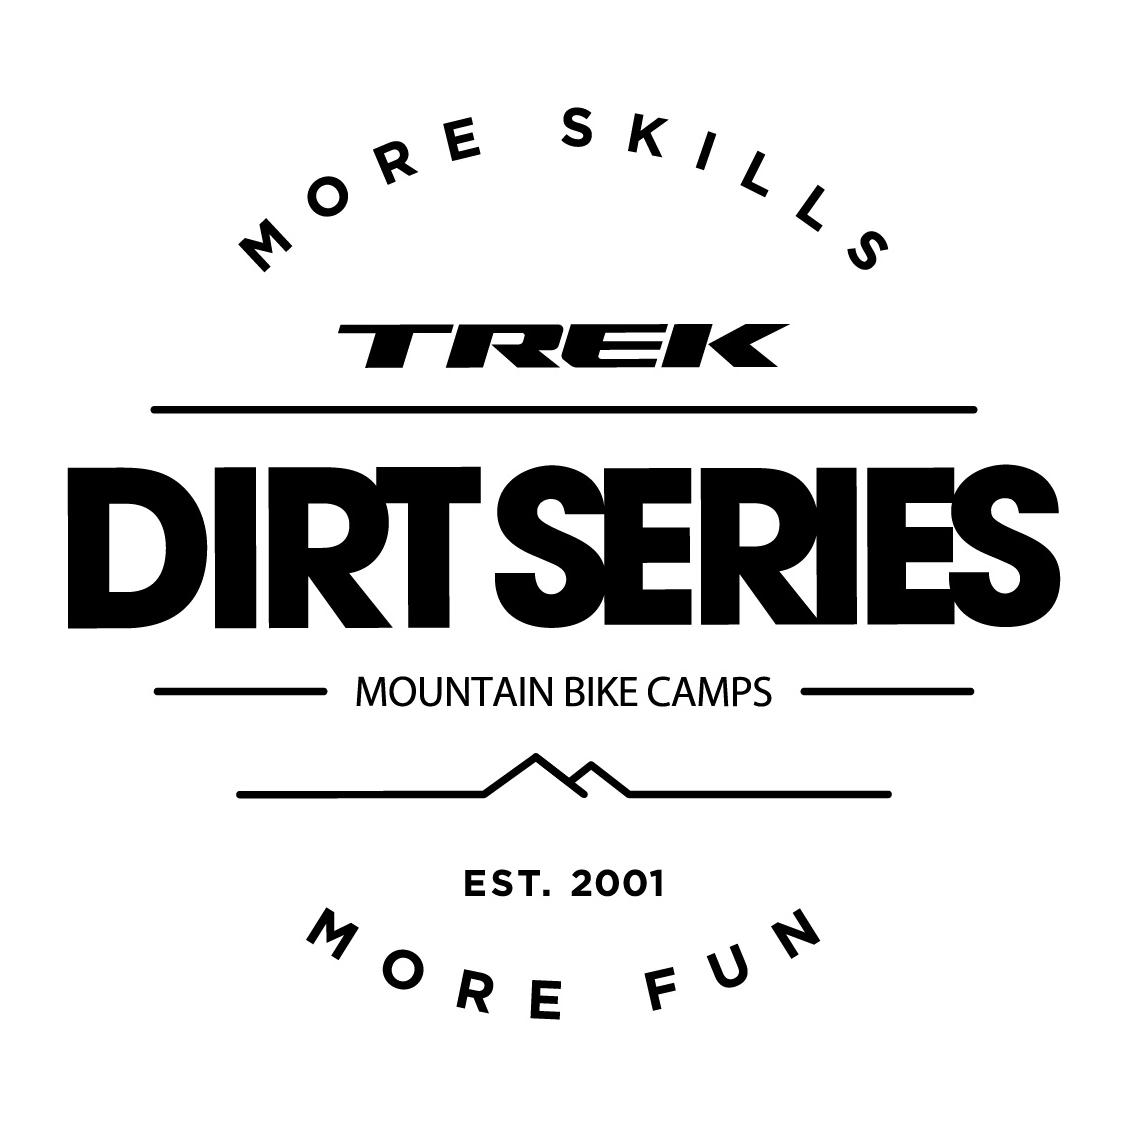 Dirt Series Mountain Bike Camp - Whistler, BC